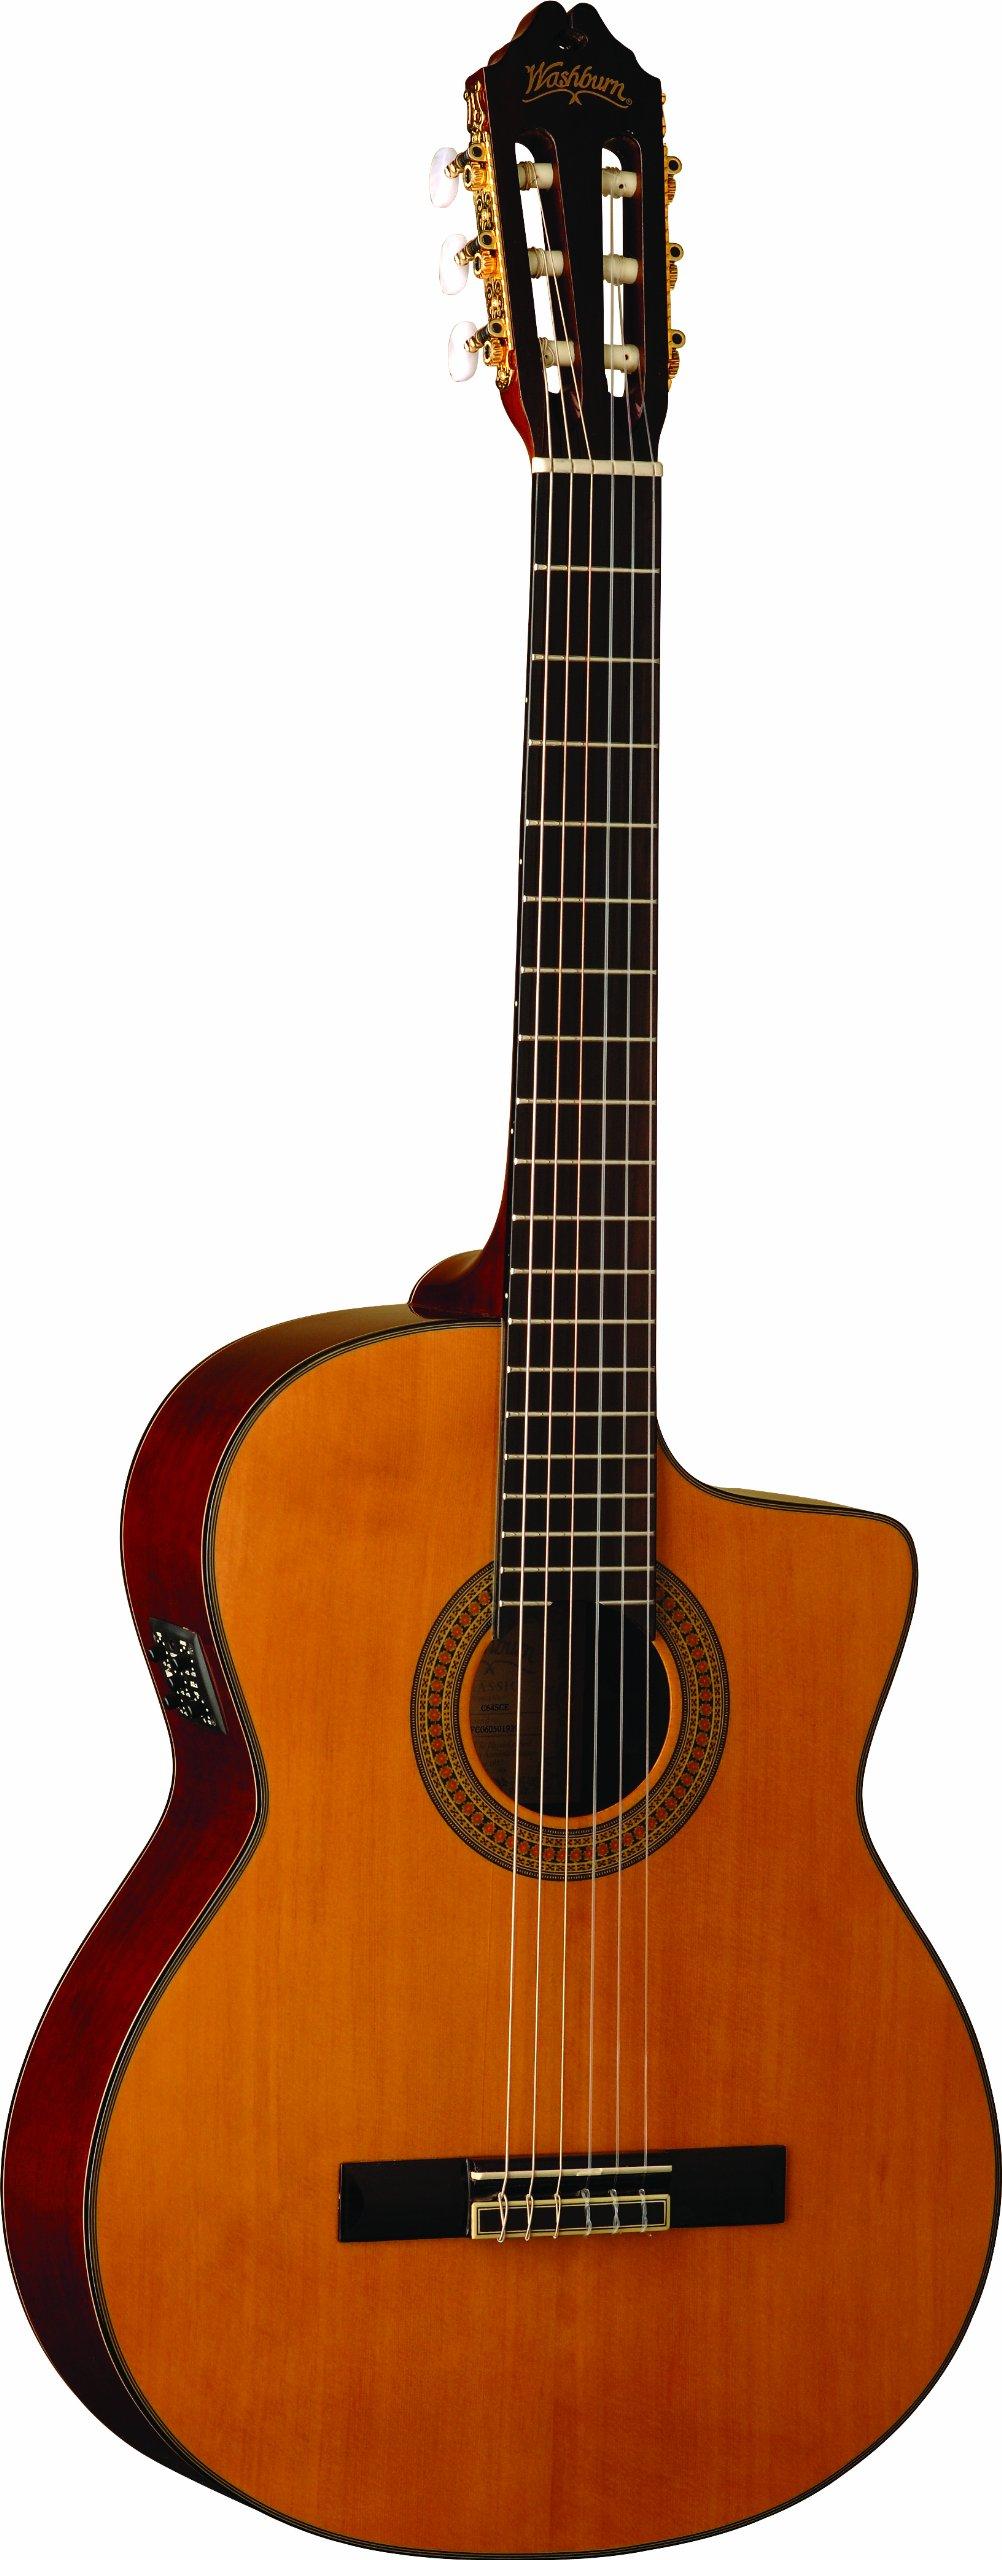 Washburn Classical Series Acoustic Electric Cutaway Guitar by Washburn